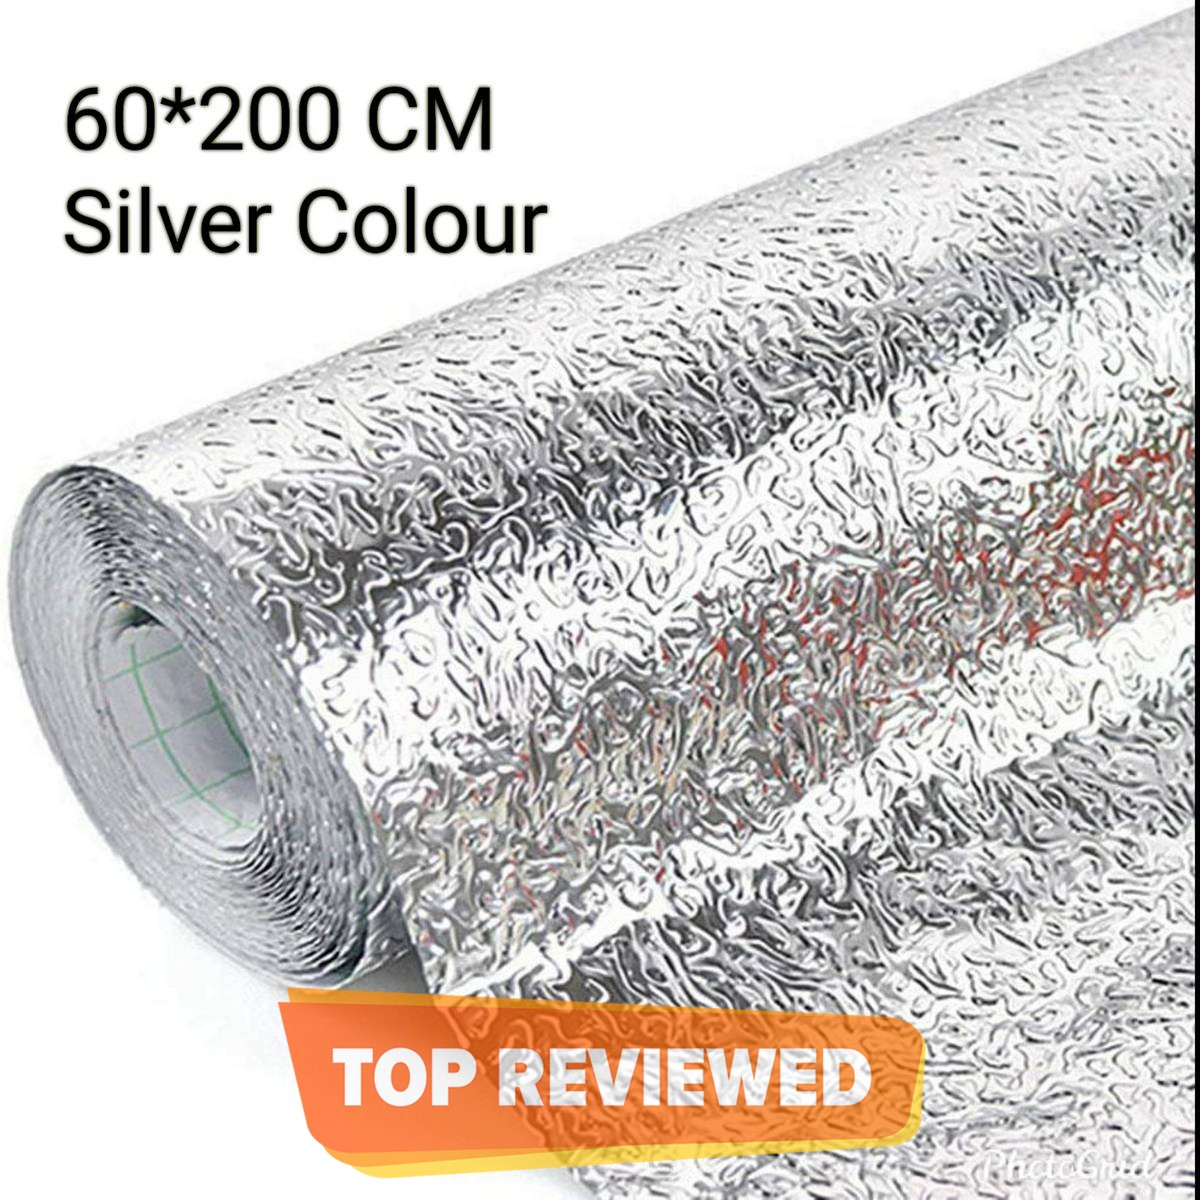 60x200cm Self Adhesive Aluminium Foil Sticker Roll, Oil Proof Waterproof Aluminium Sheet DIY Wallpaper, Backsplash Aluminium Sticker for Home, Kitchen, Stove, Cabinet, Wall, Drawers, Furniture, Silver Colour